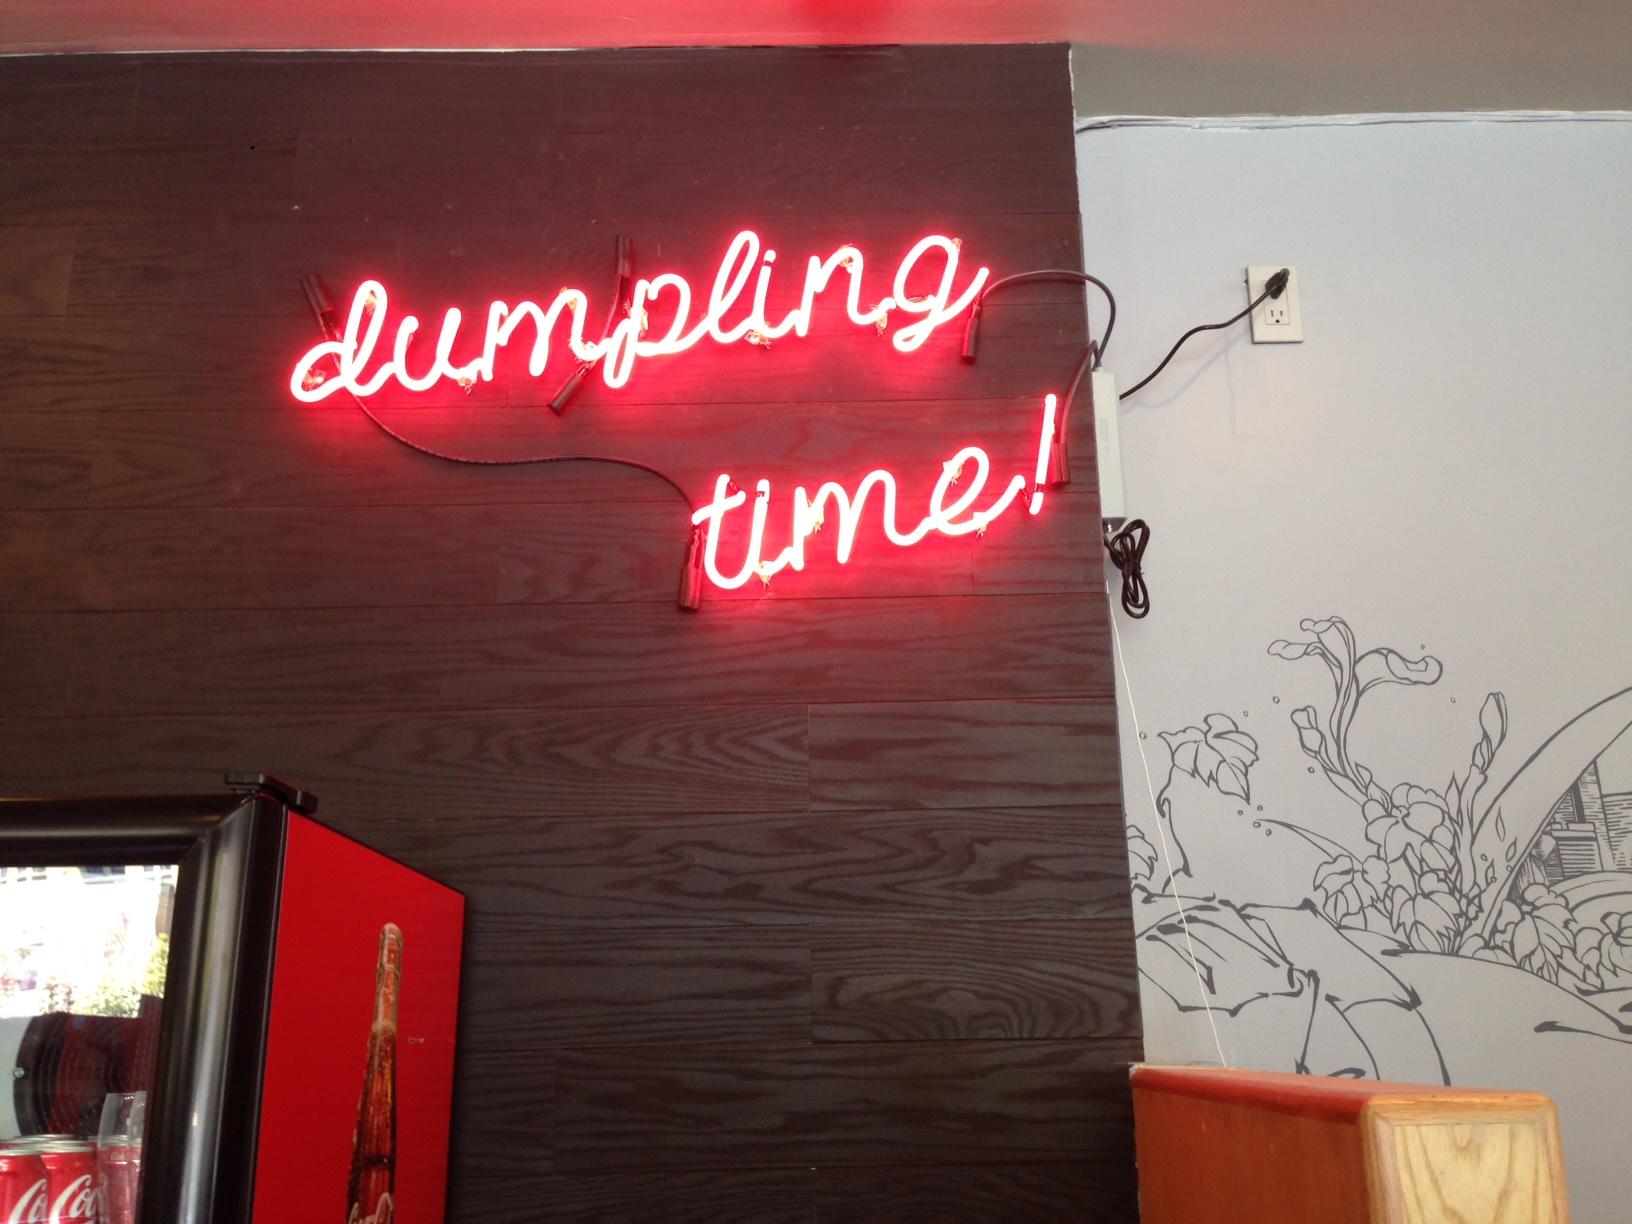 Dumpling Time neon sign.